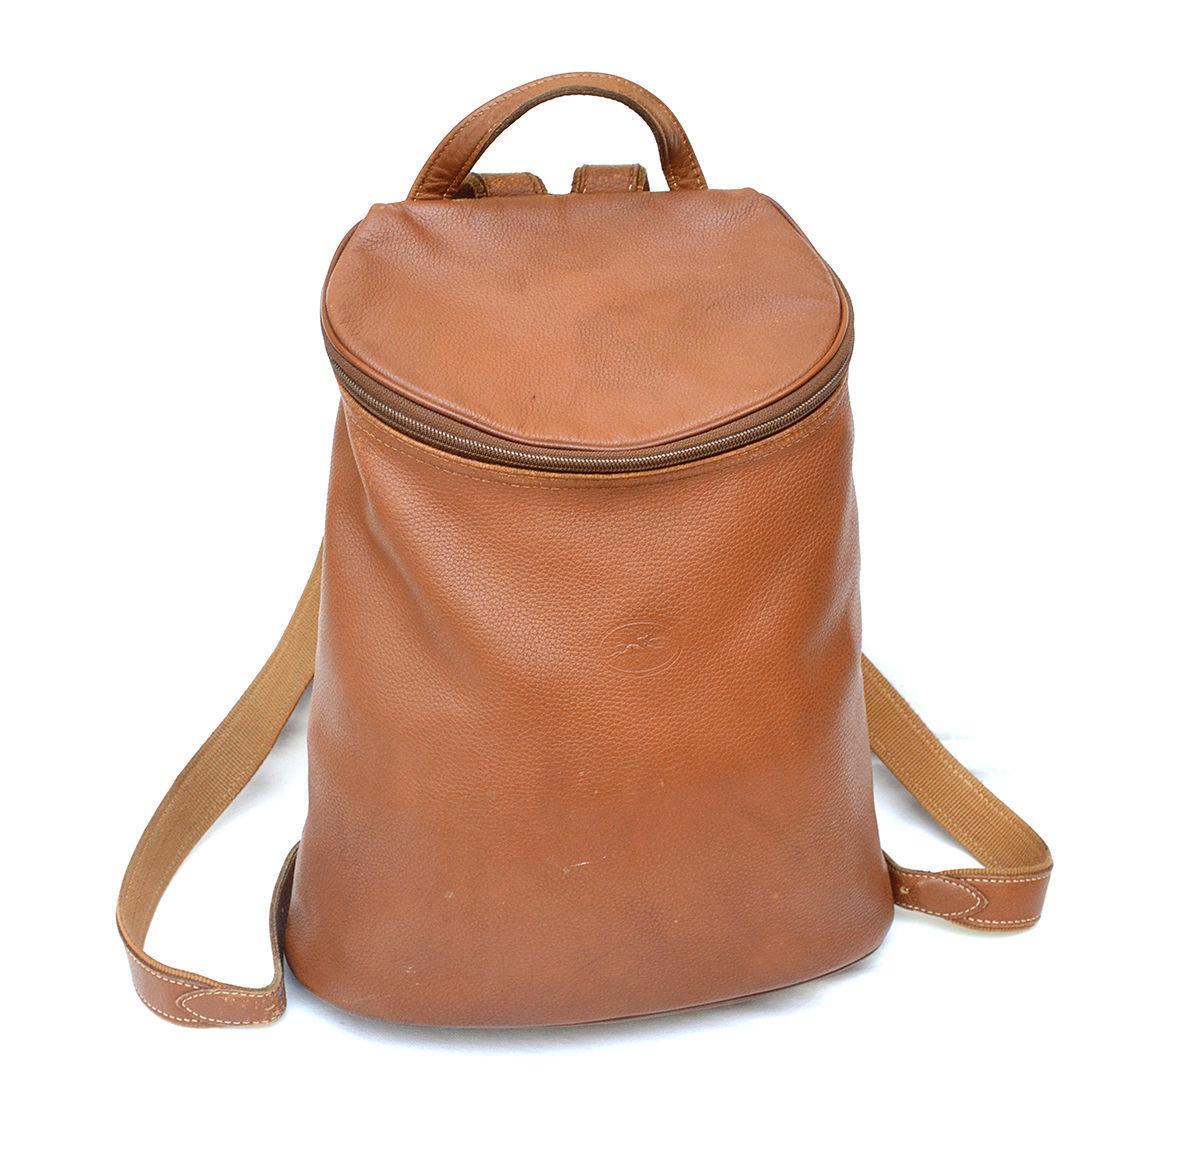 longchamp backpack dakine backpack black leather backpack